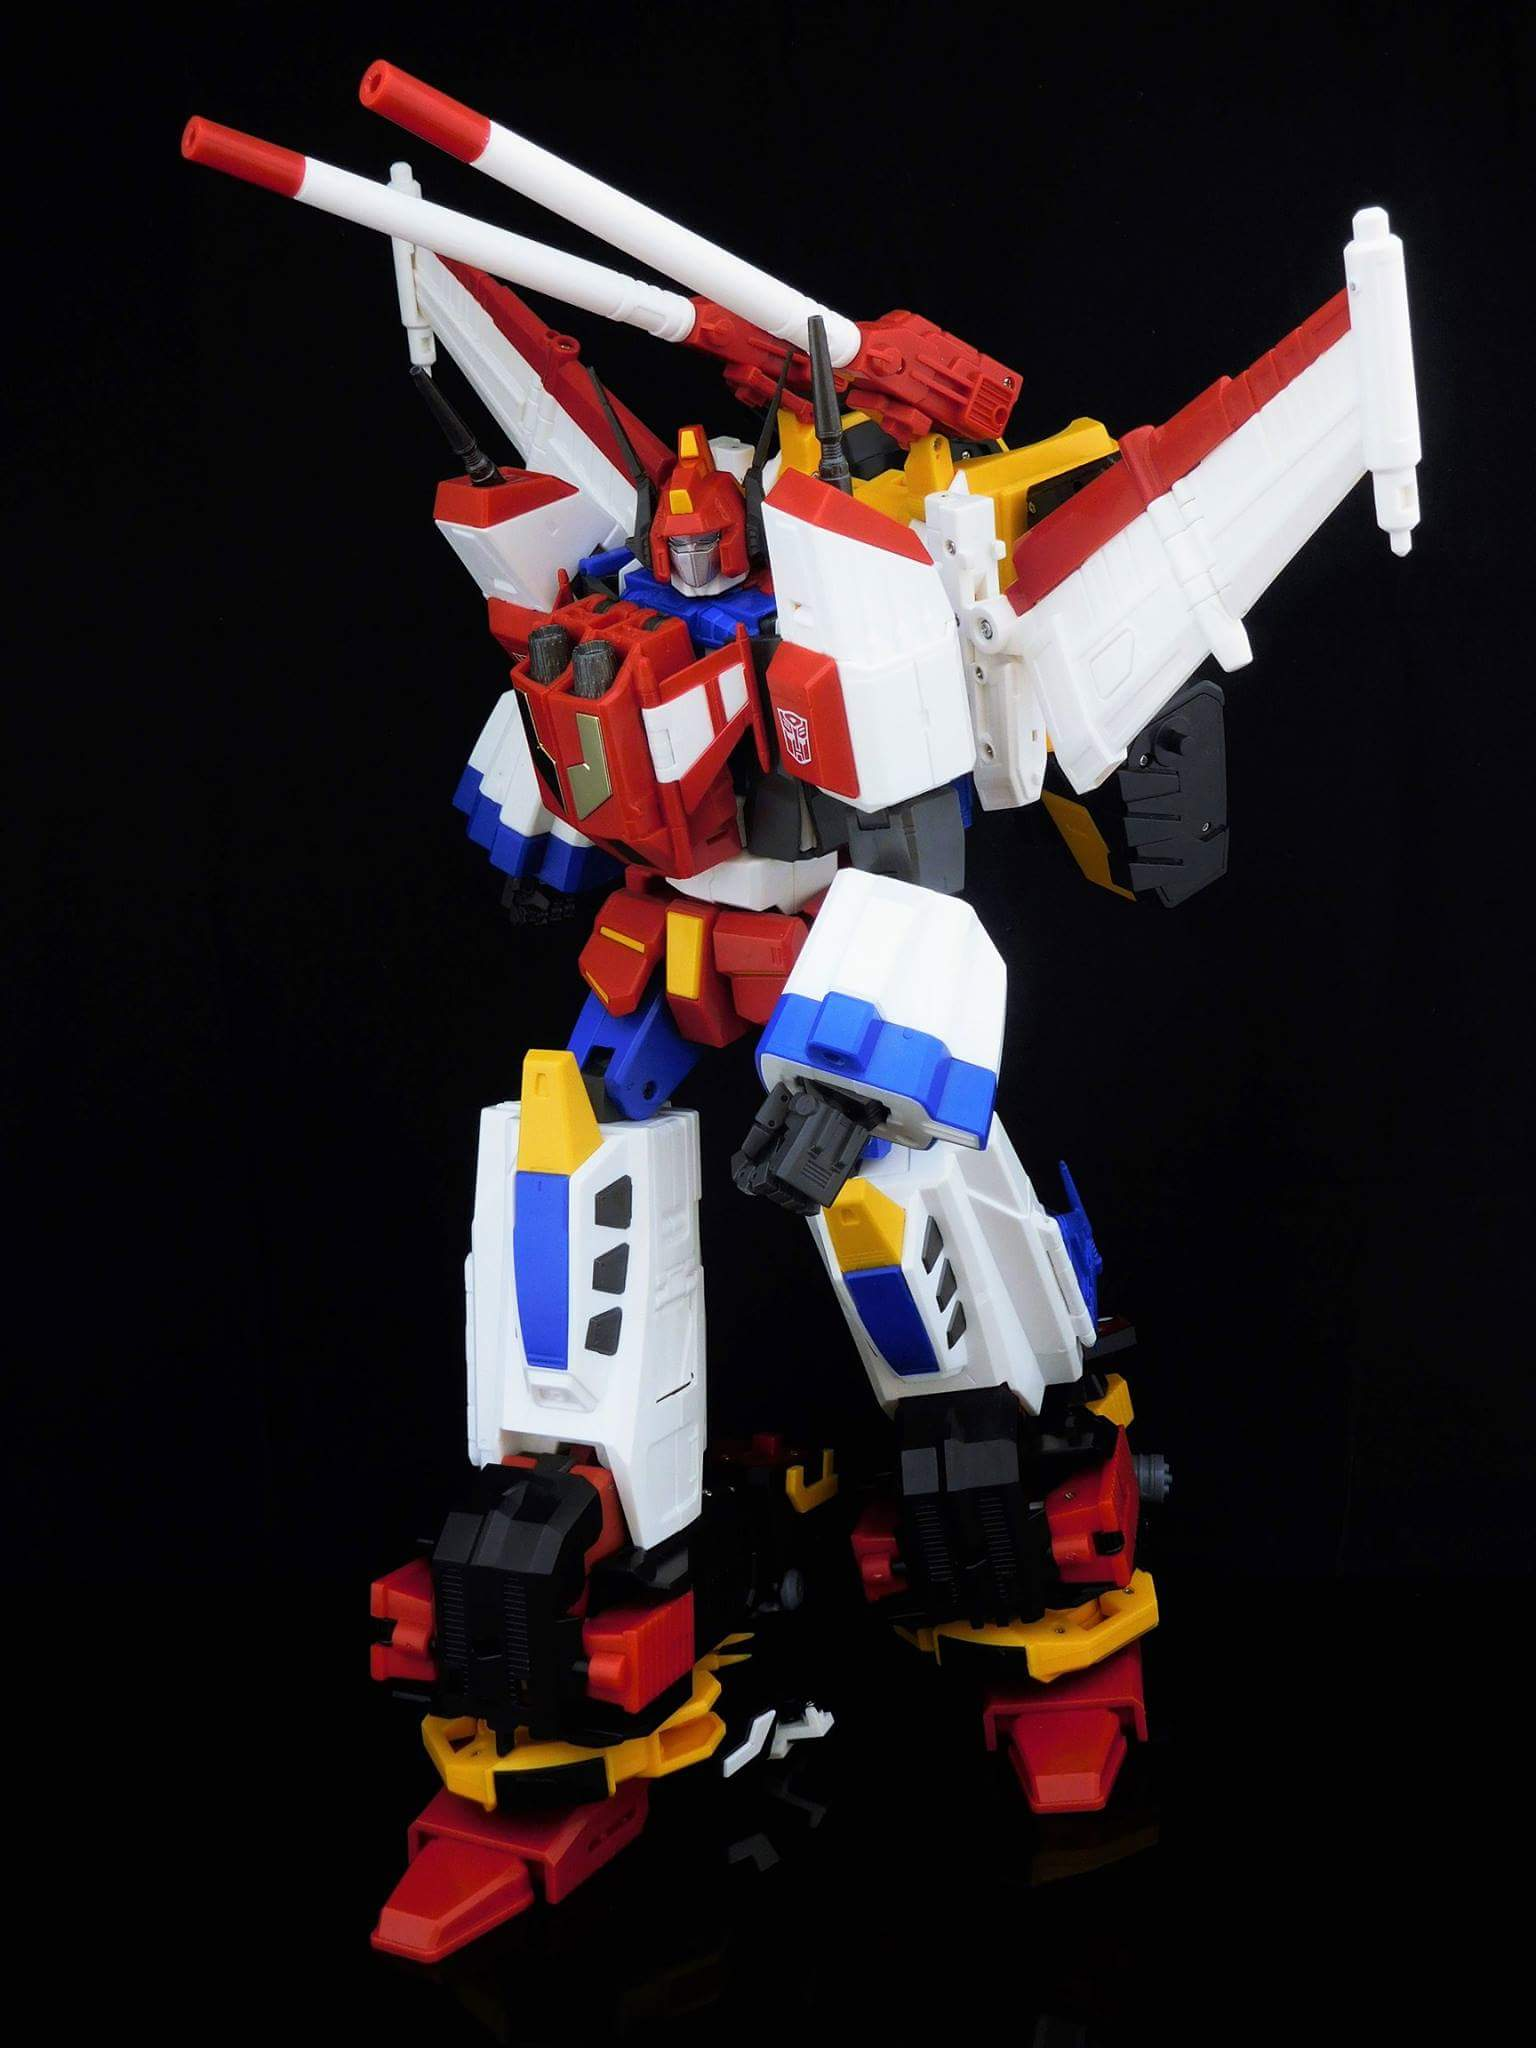 [KFC Toys] Produit Tiers - Jouet Phase 8-A Simba - aka Victory Leo (Transformers Victory) - Page 2 OJYd994o